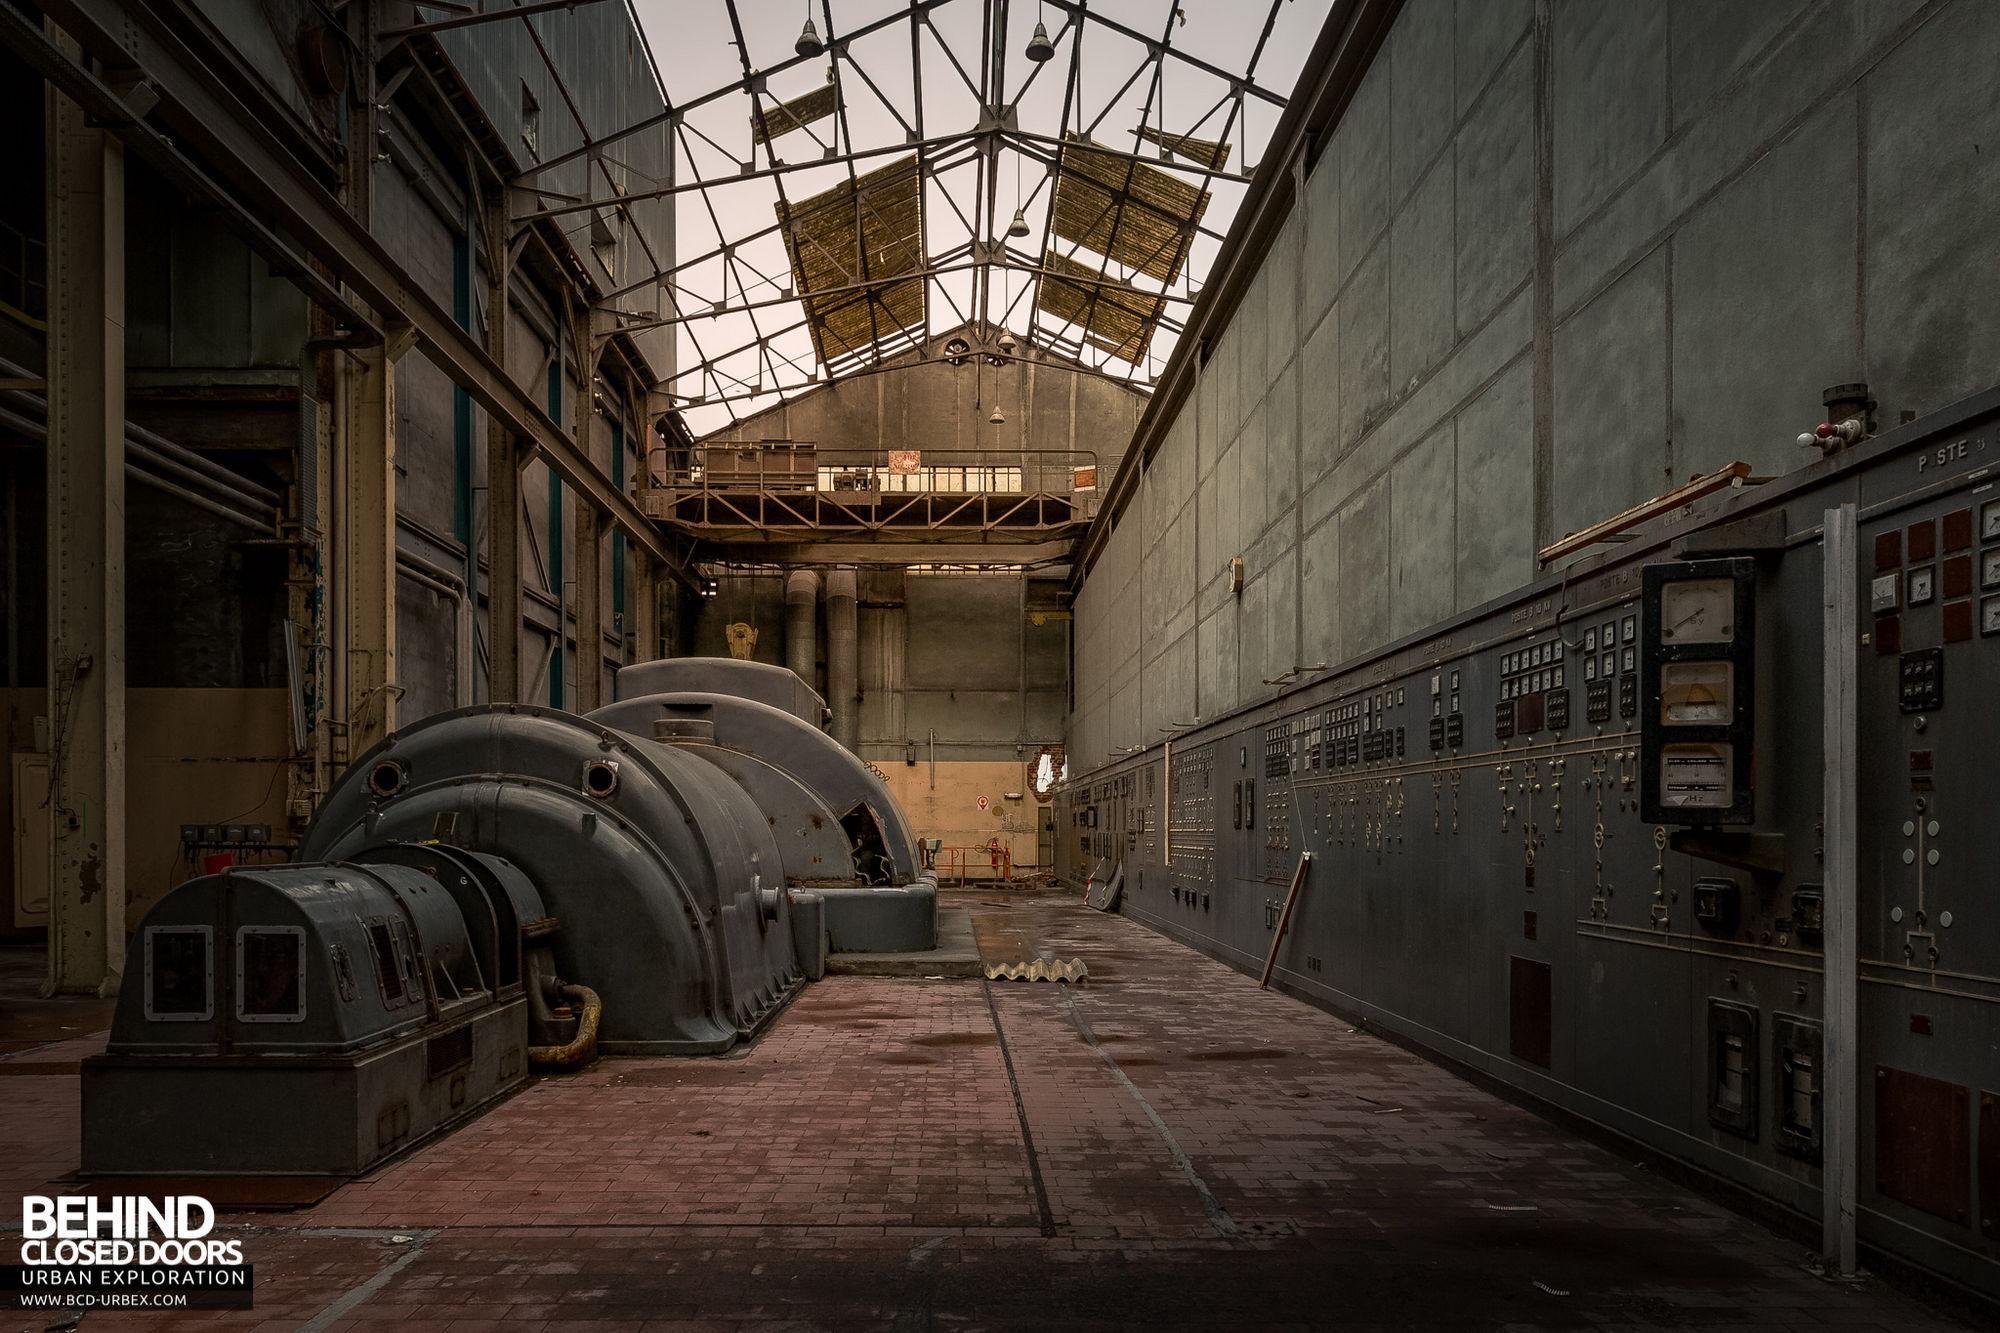 Stora Enso, Corbehem - Original turbine hall